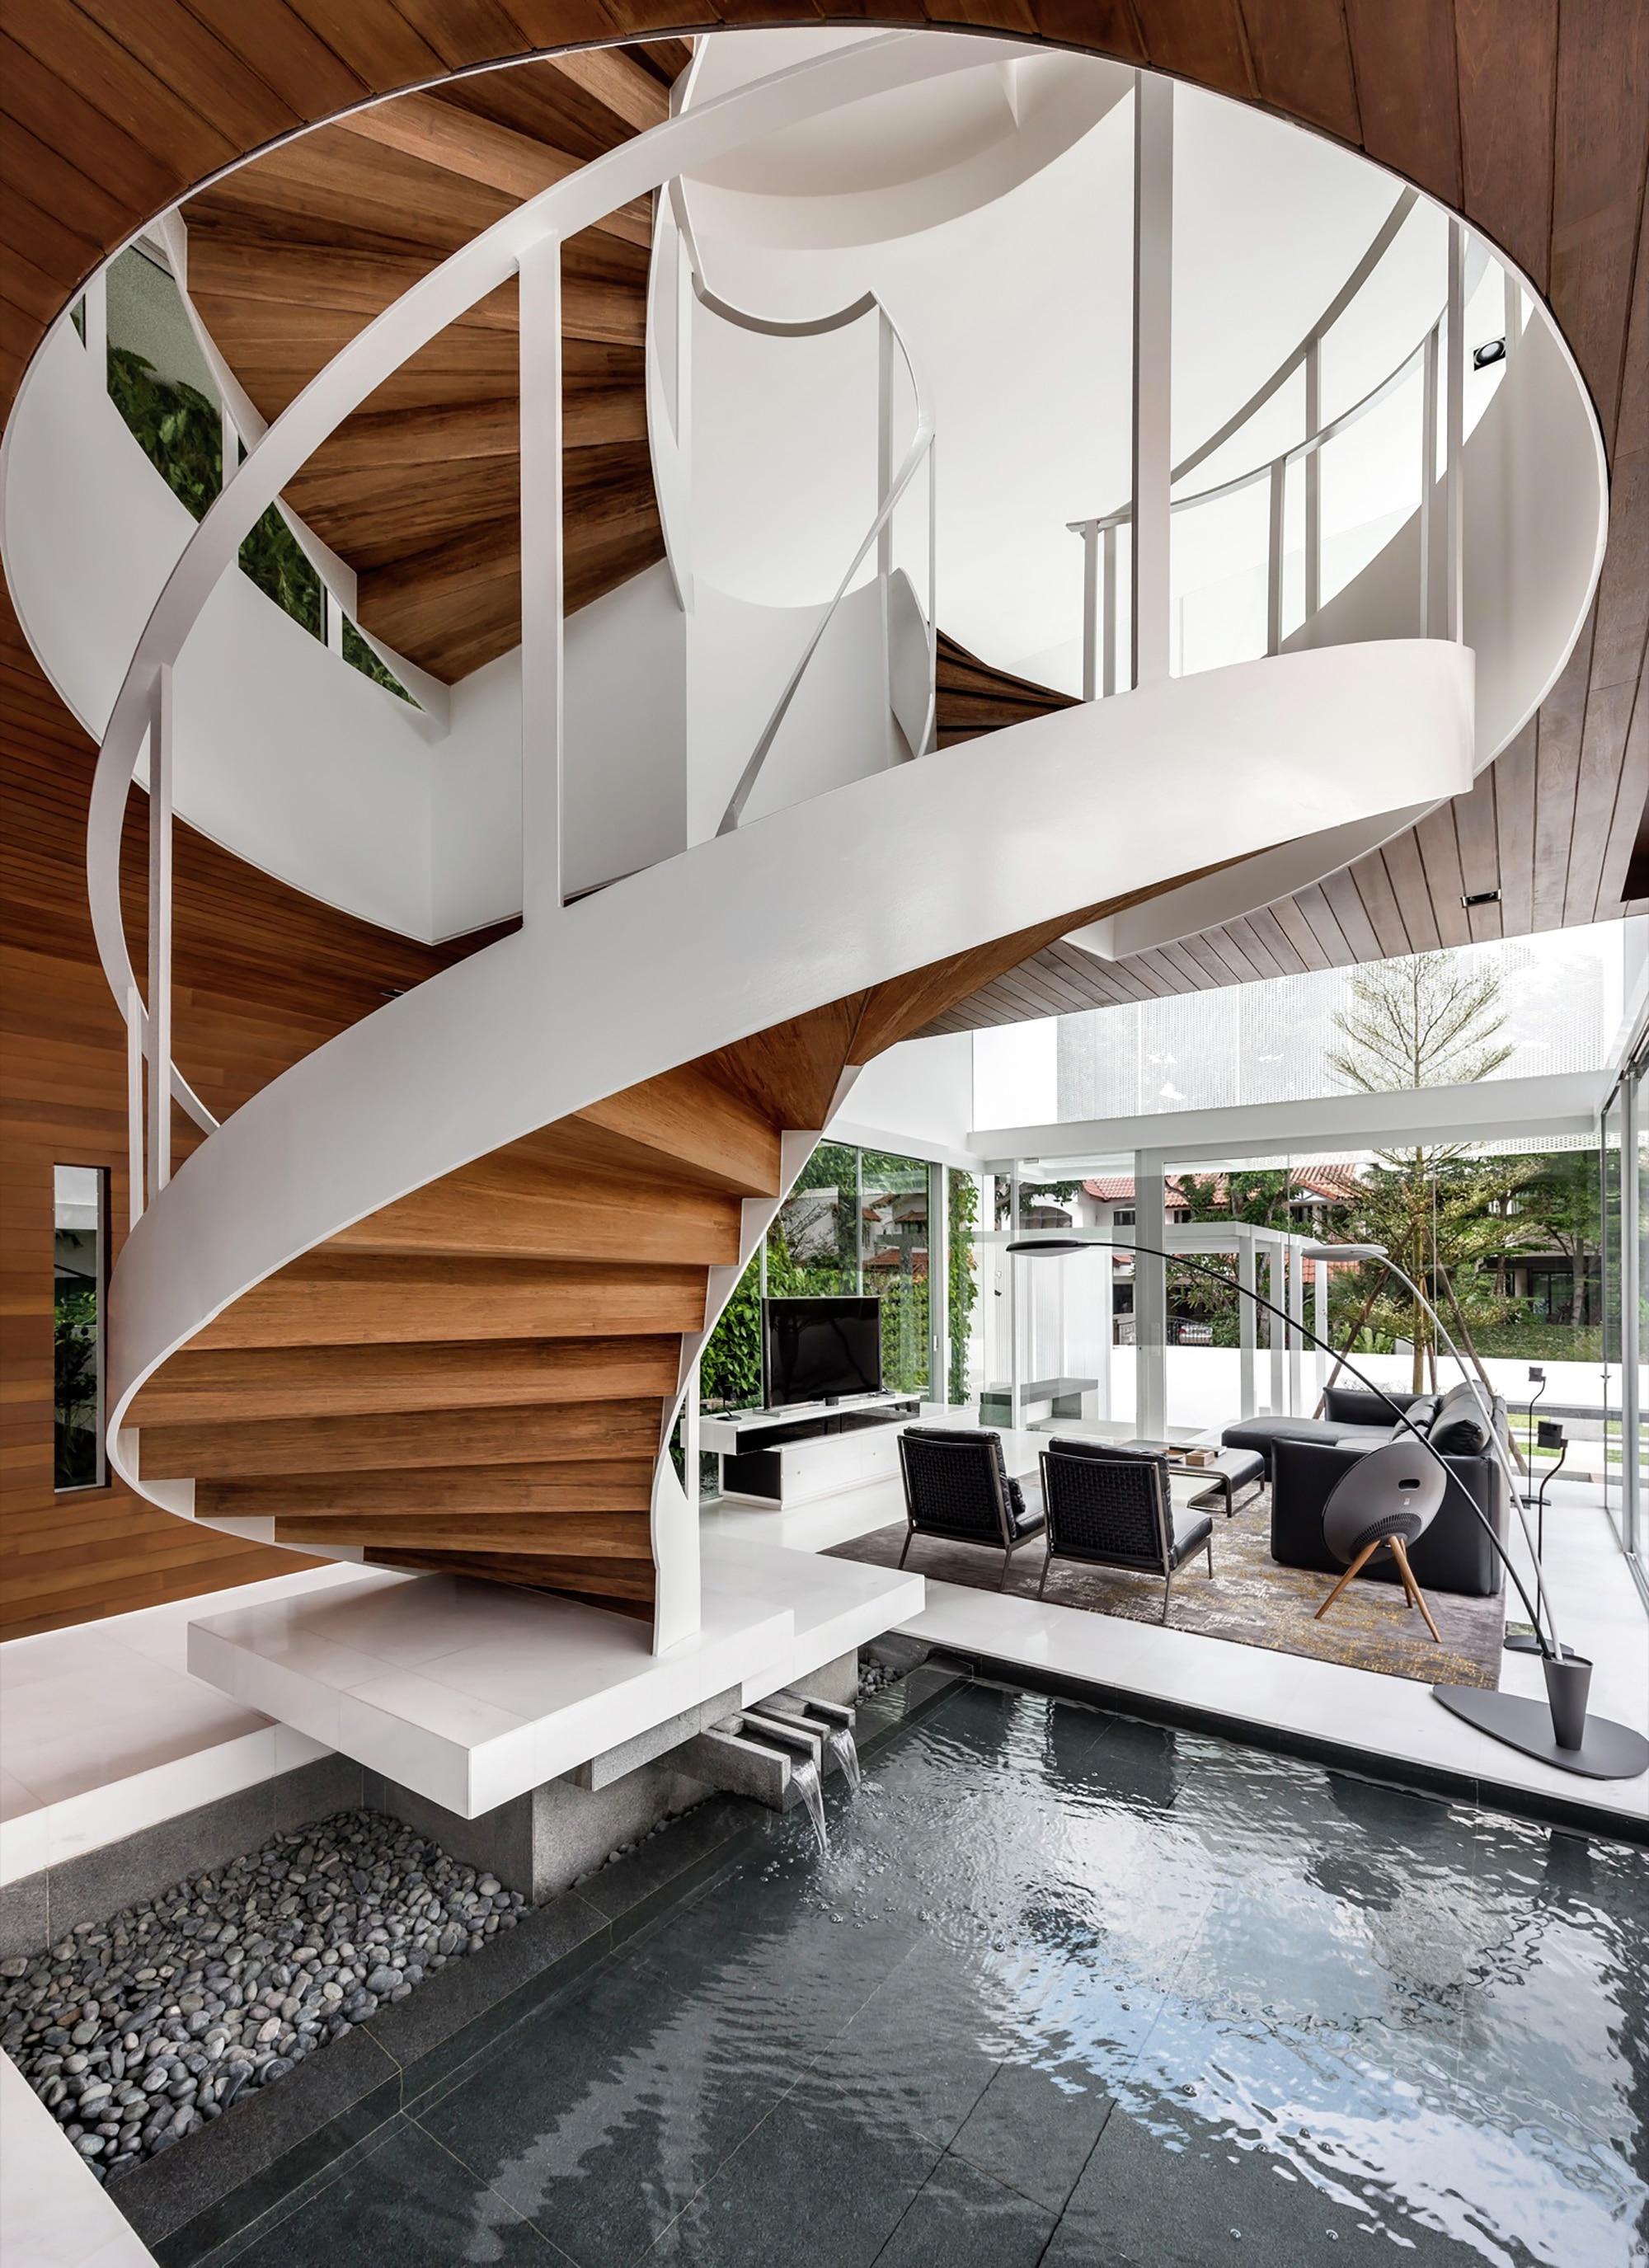 Casa moderna cuatro dormitorios construye hogar for Diseno de interiores dibujos